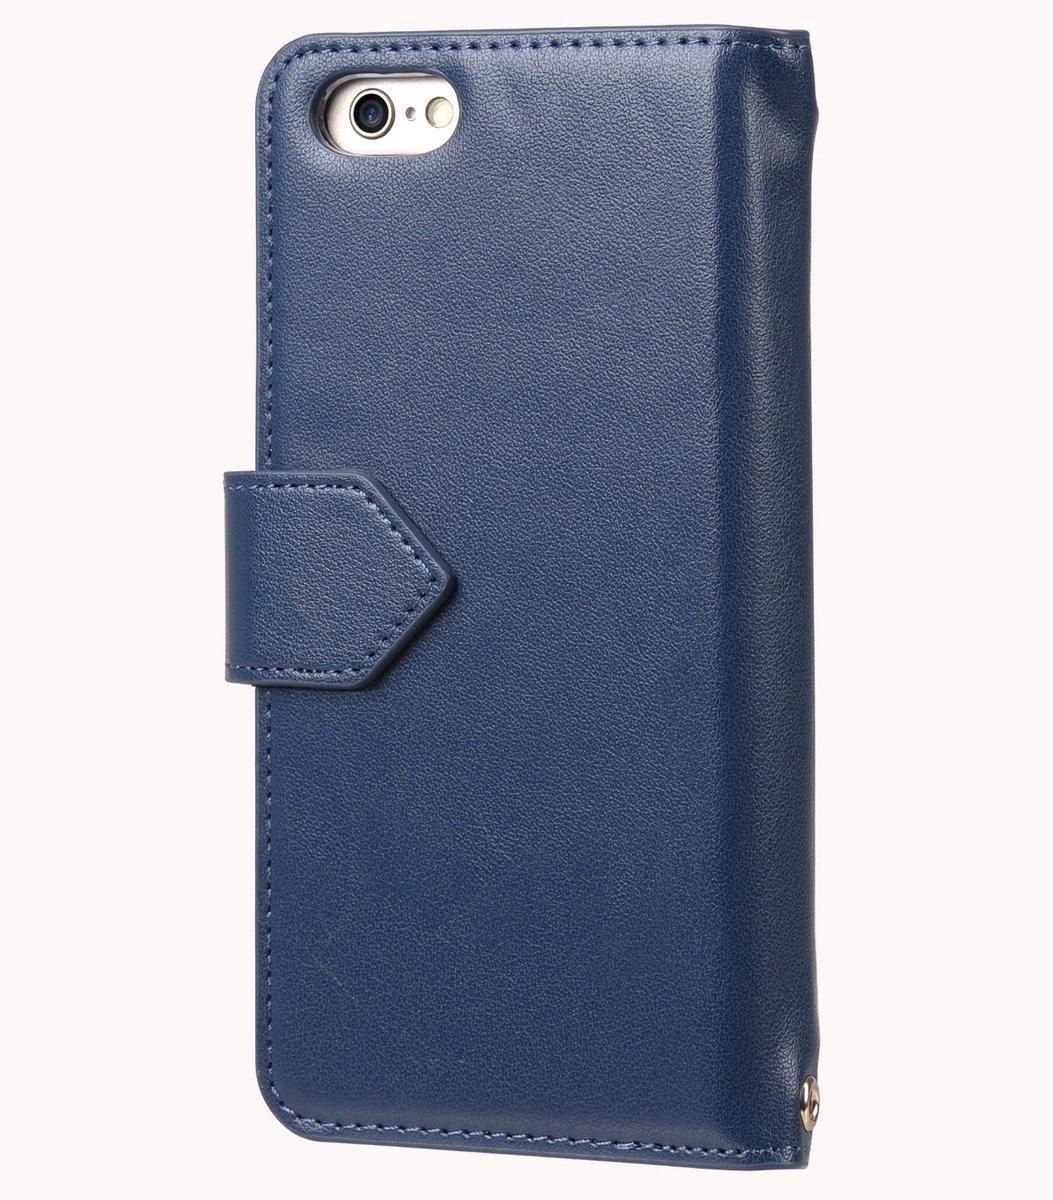 Kuboq日本袖珍套為iPhone6S-深藍色